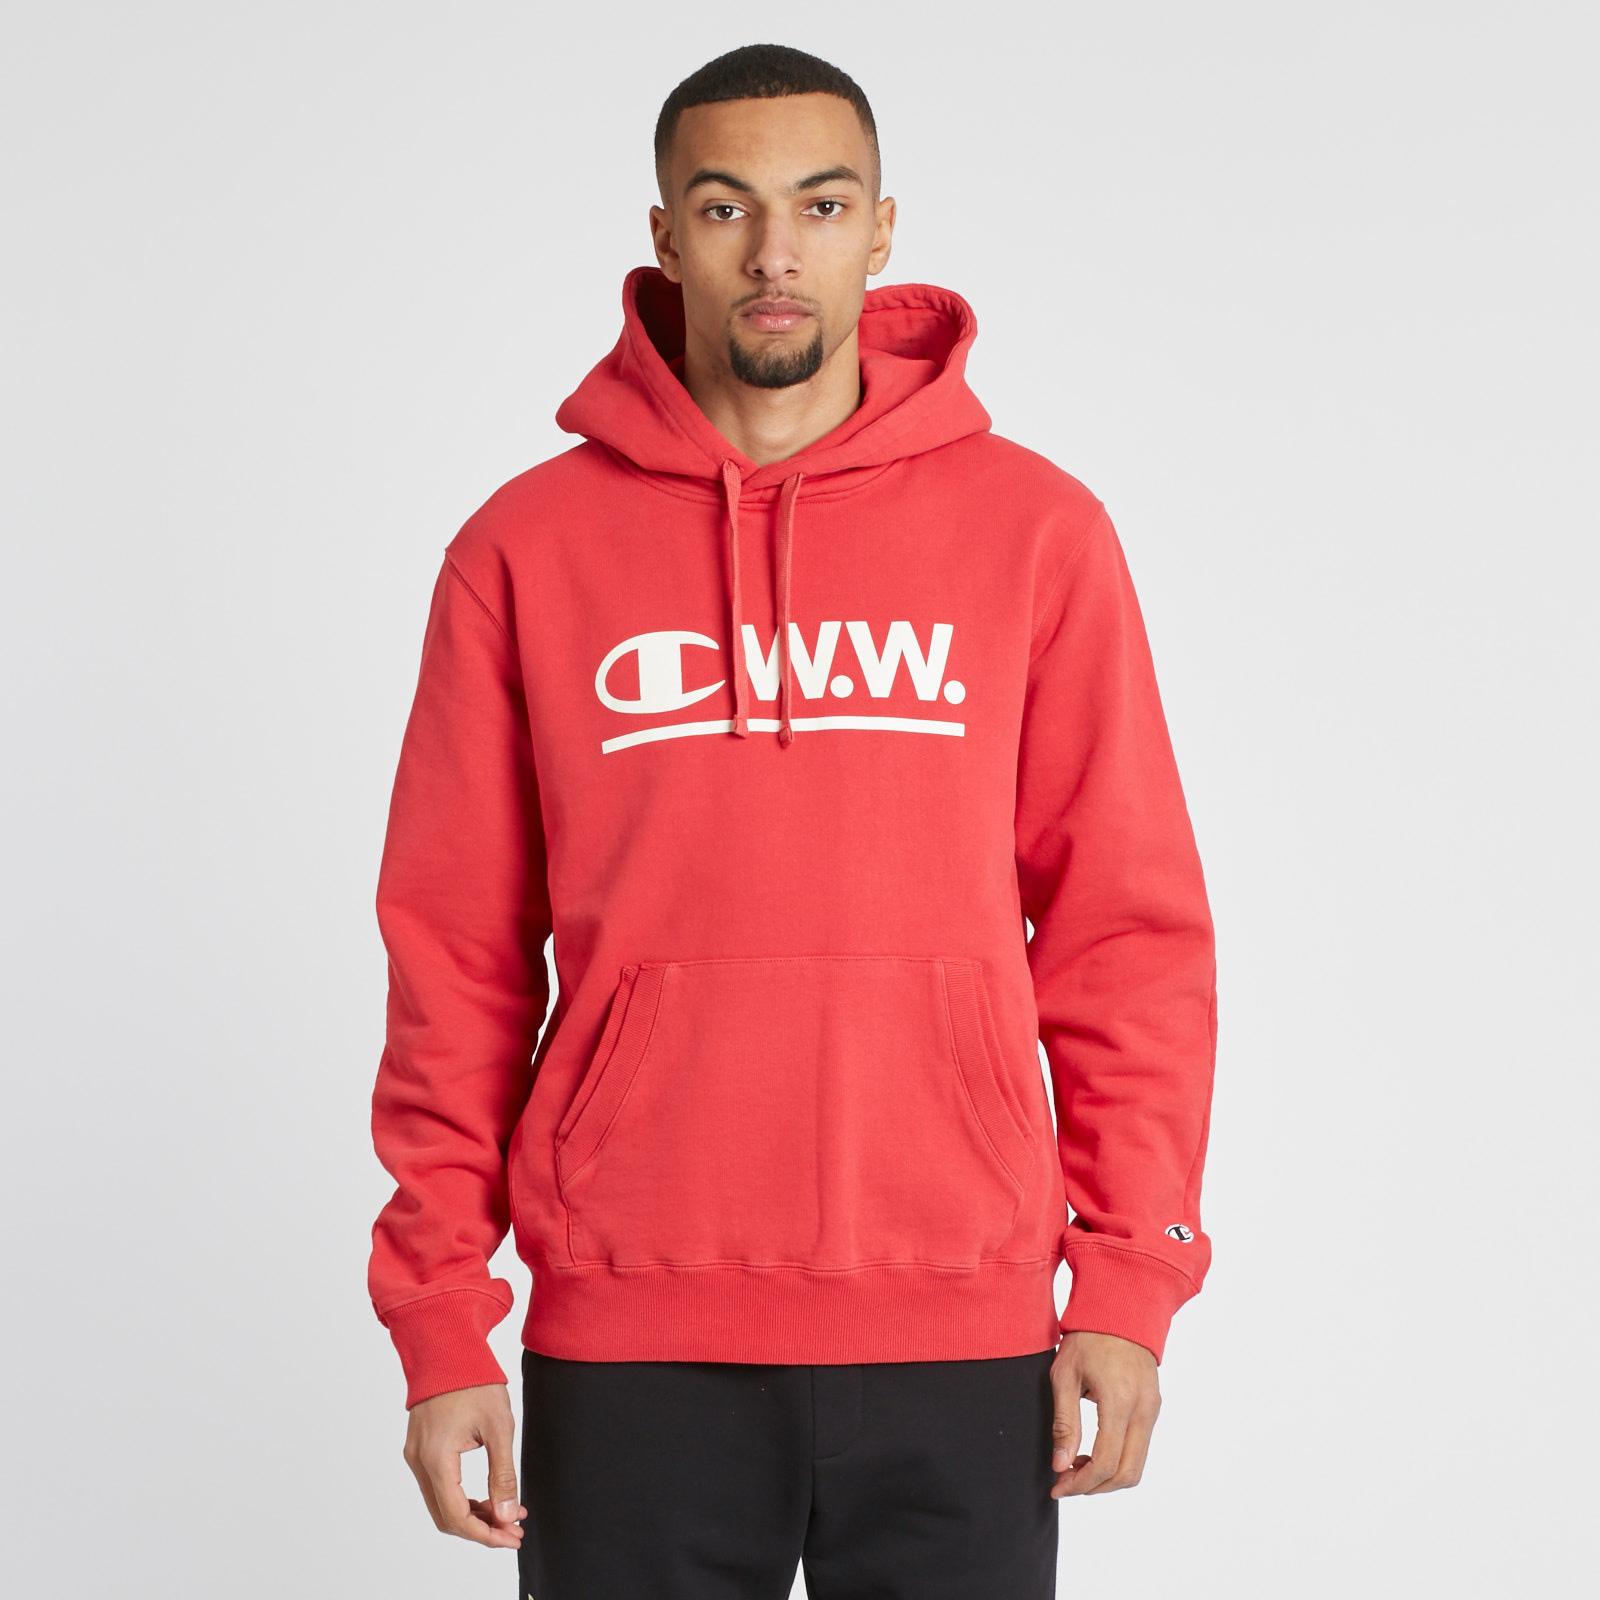 db2f120d26c Champion Reverse Weave Hooded Sweatshirt - 211878-rs043 ...